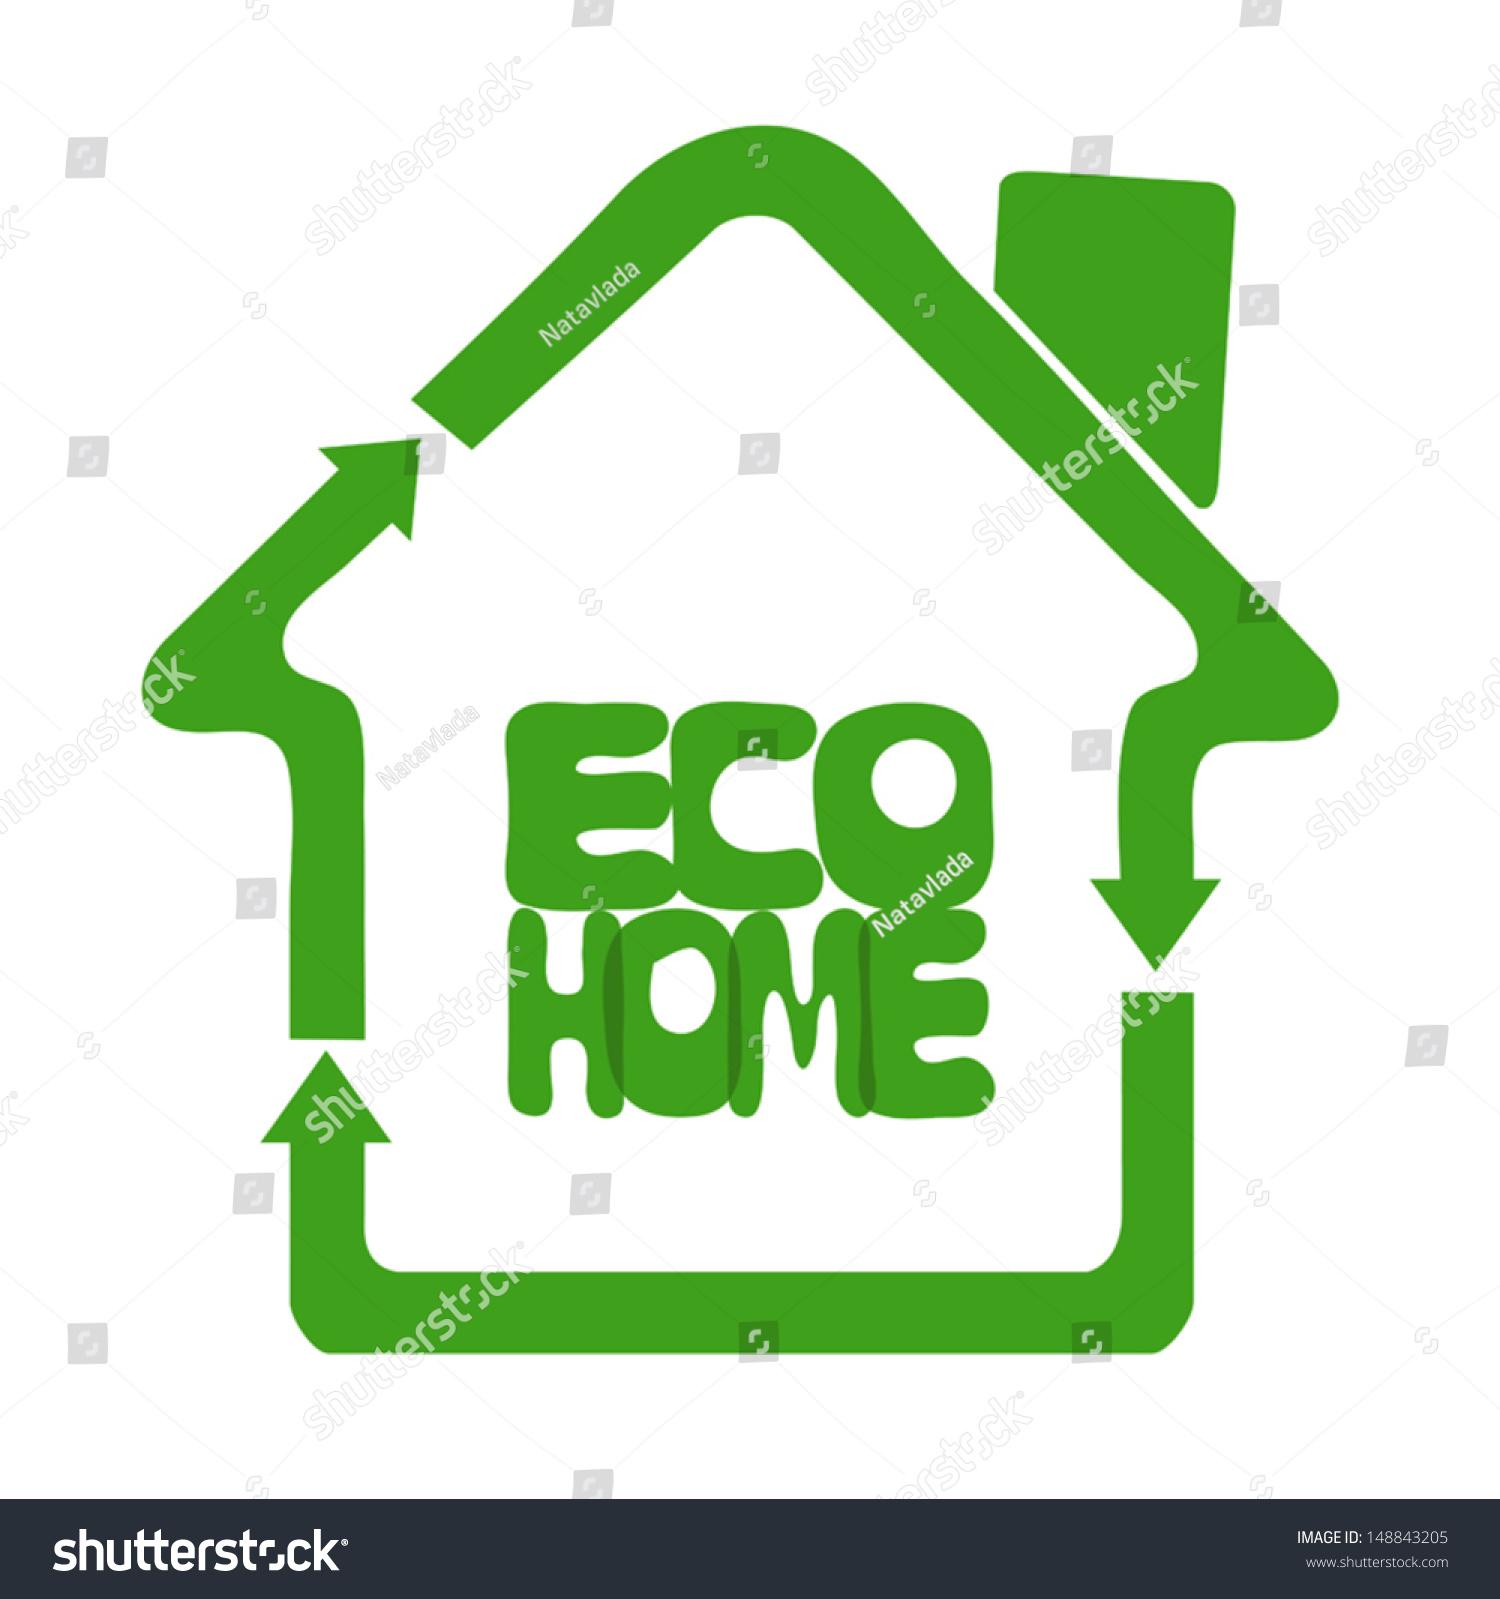 Eco 372 term definition